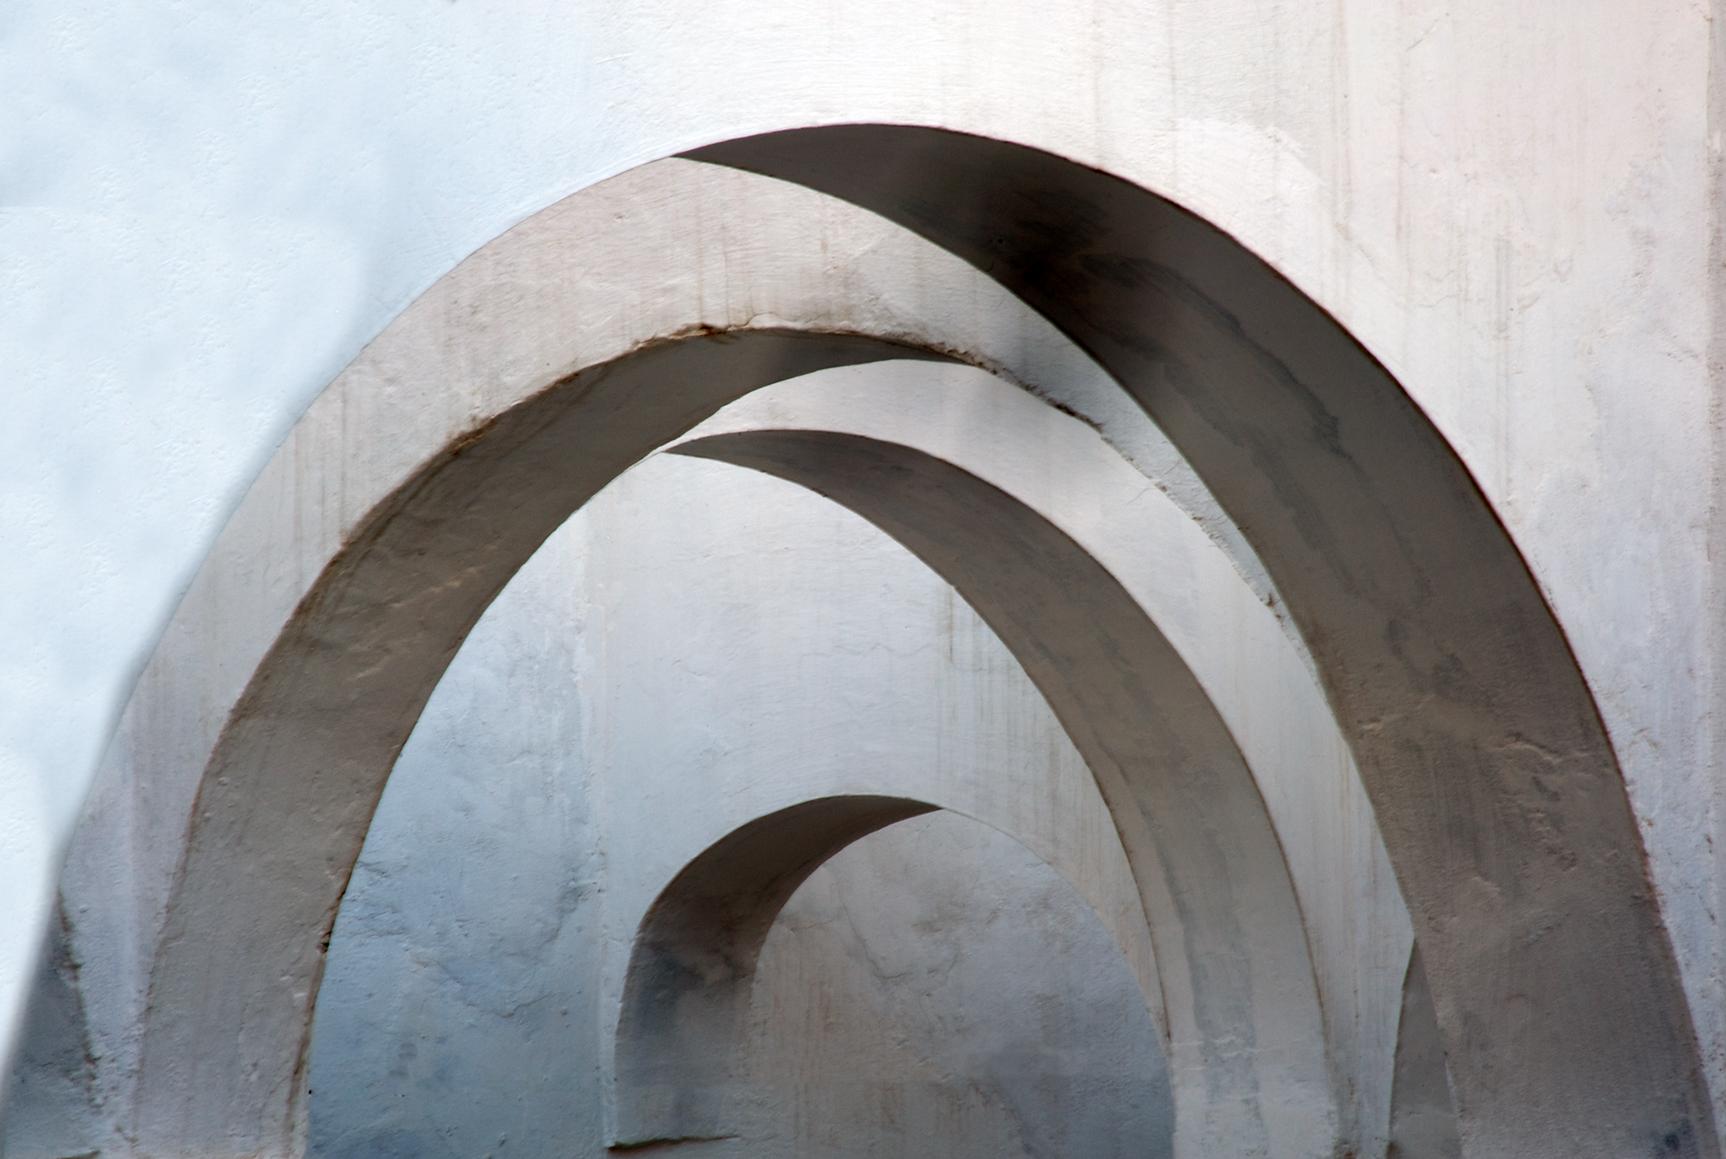 Mauseleum Arches, Libya (010050)